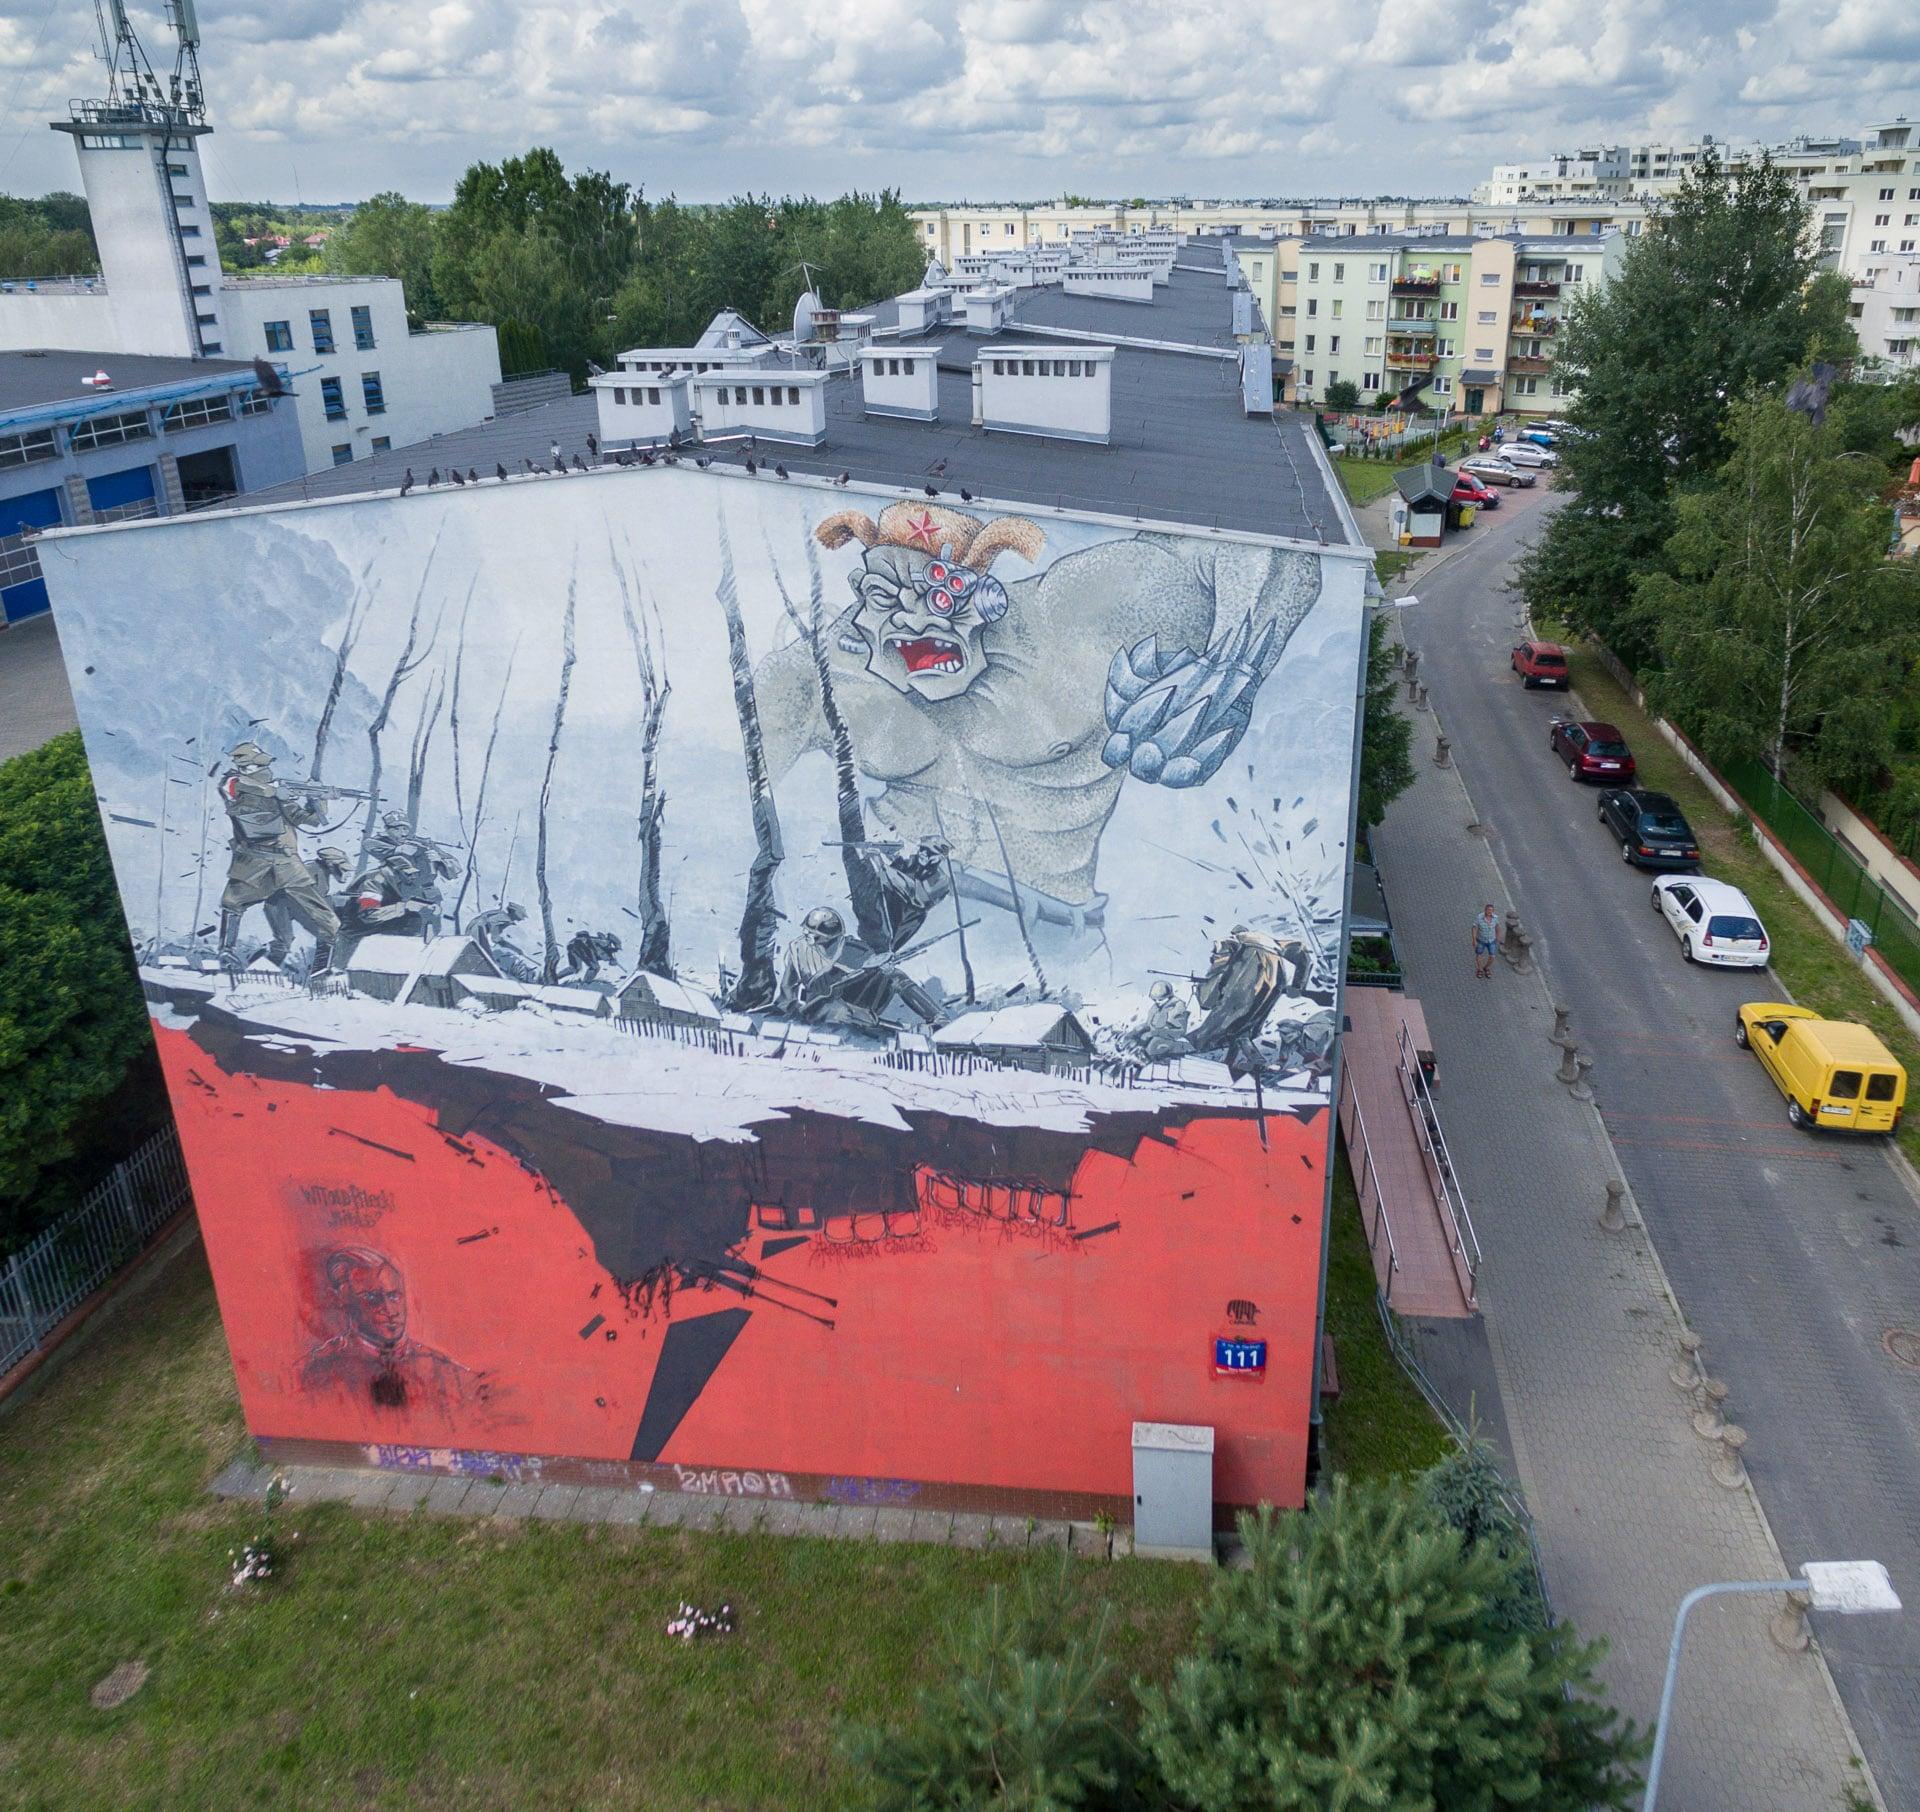 Mural - rotmistrz Witold Pilecki